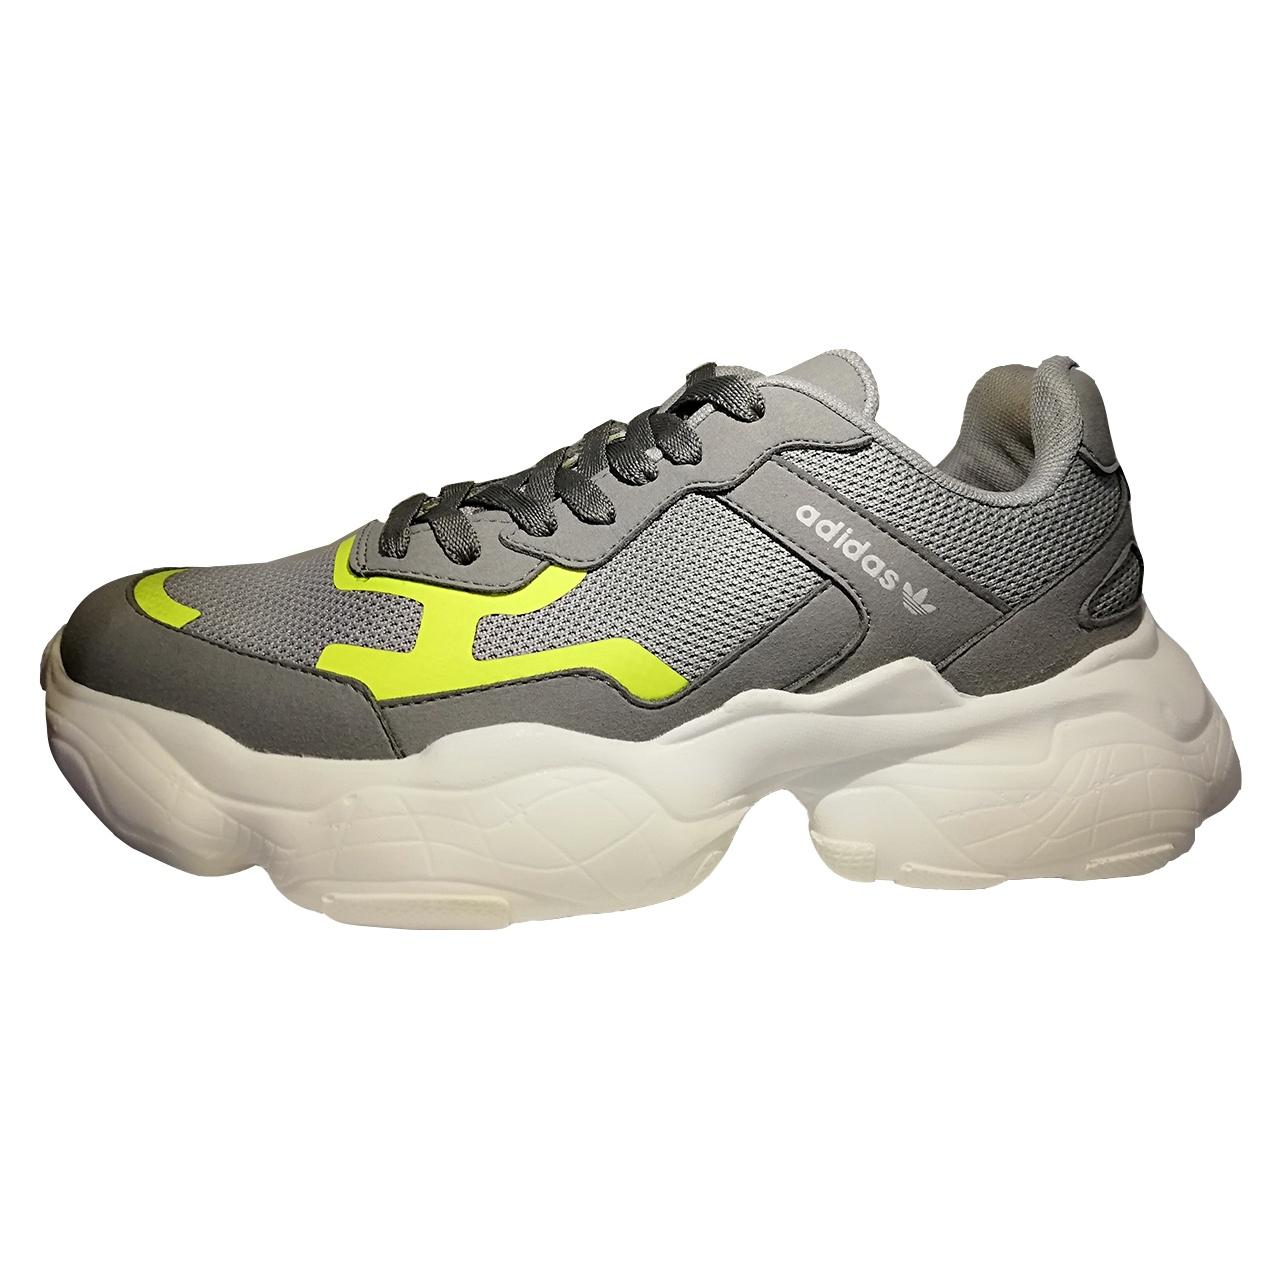 خرید                      کفش اسپورت مردانه کد 0801